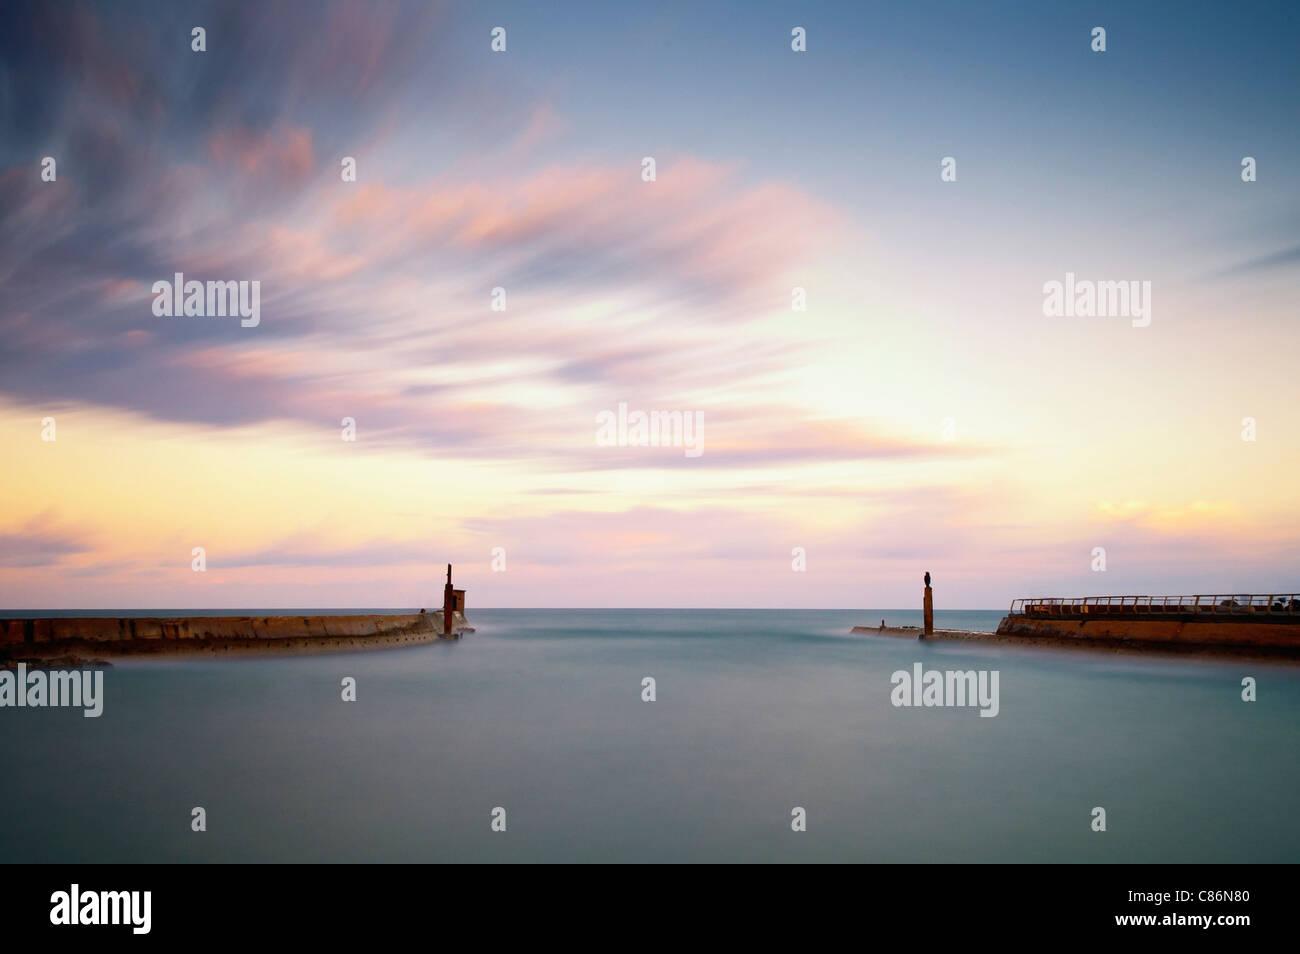 Long exposure of the sunrise over deserted harbor - Stock Image